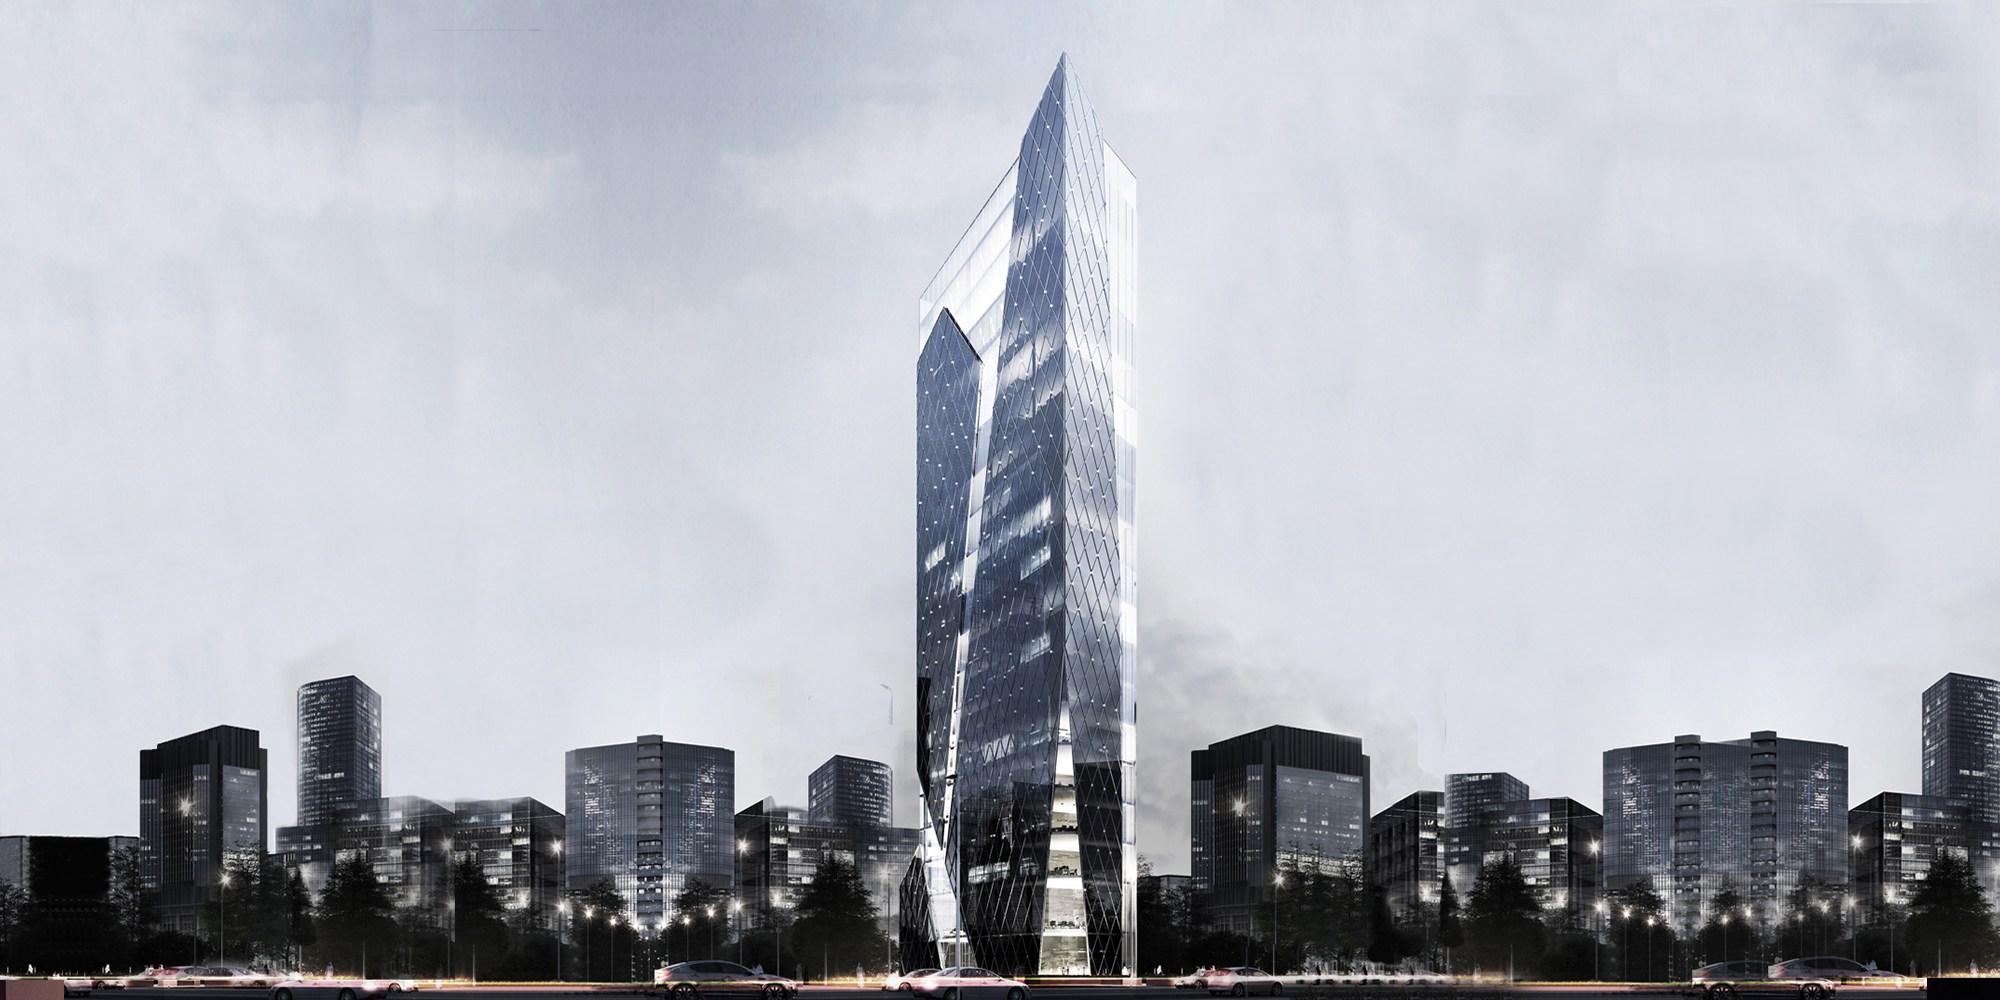 <p>City Tower</p>